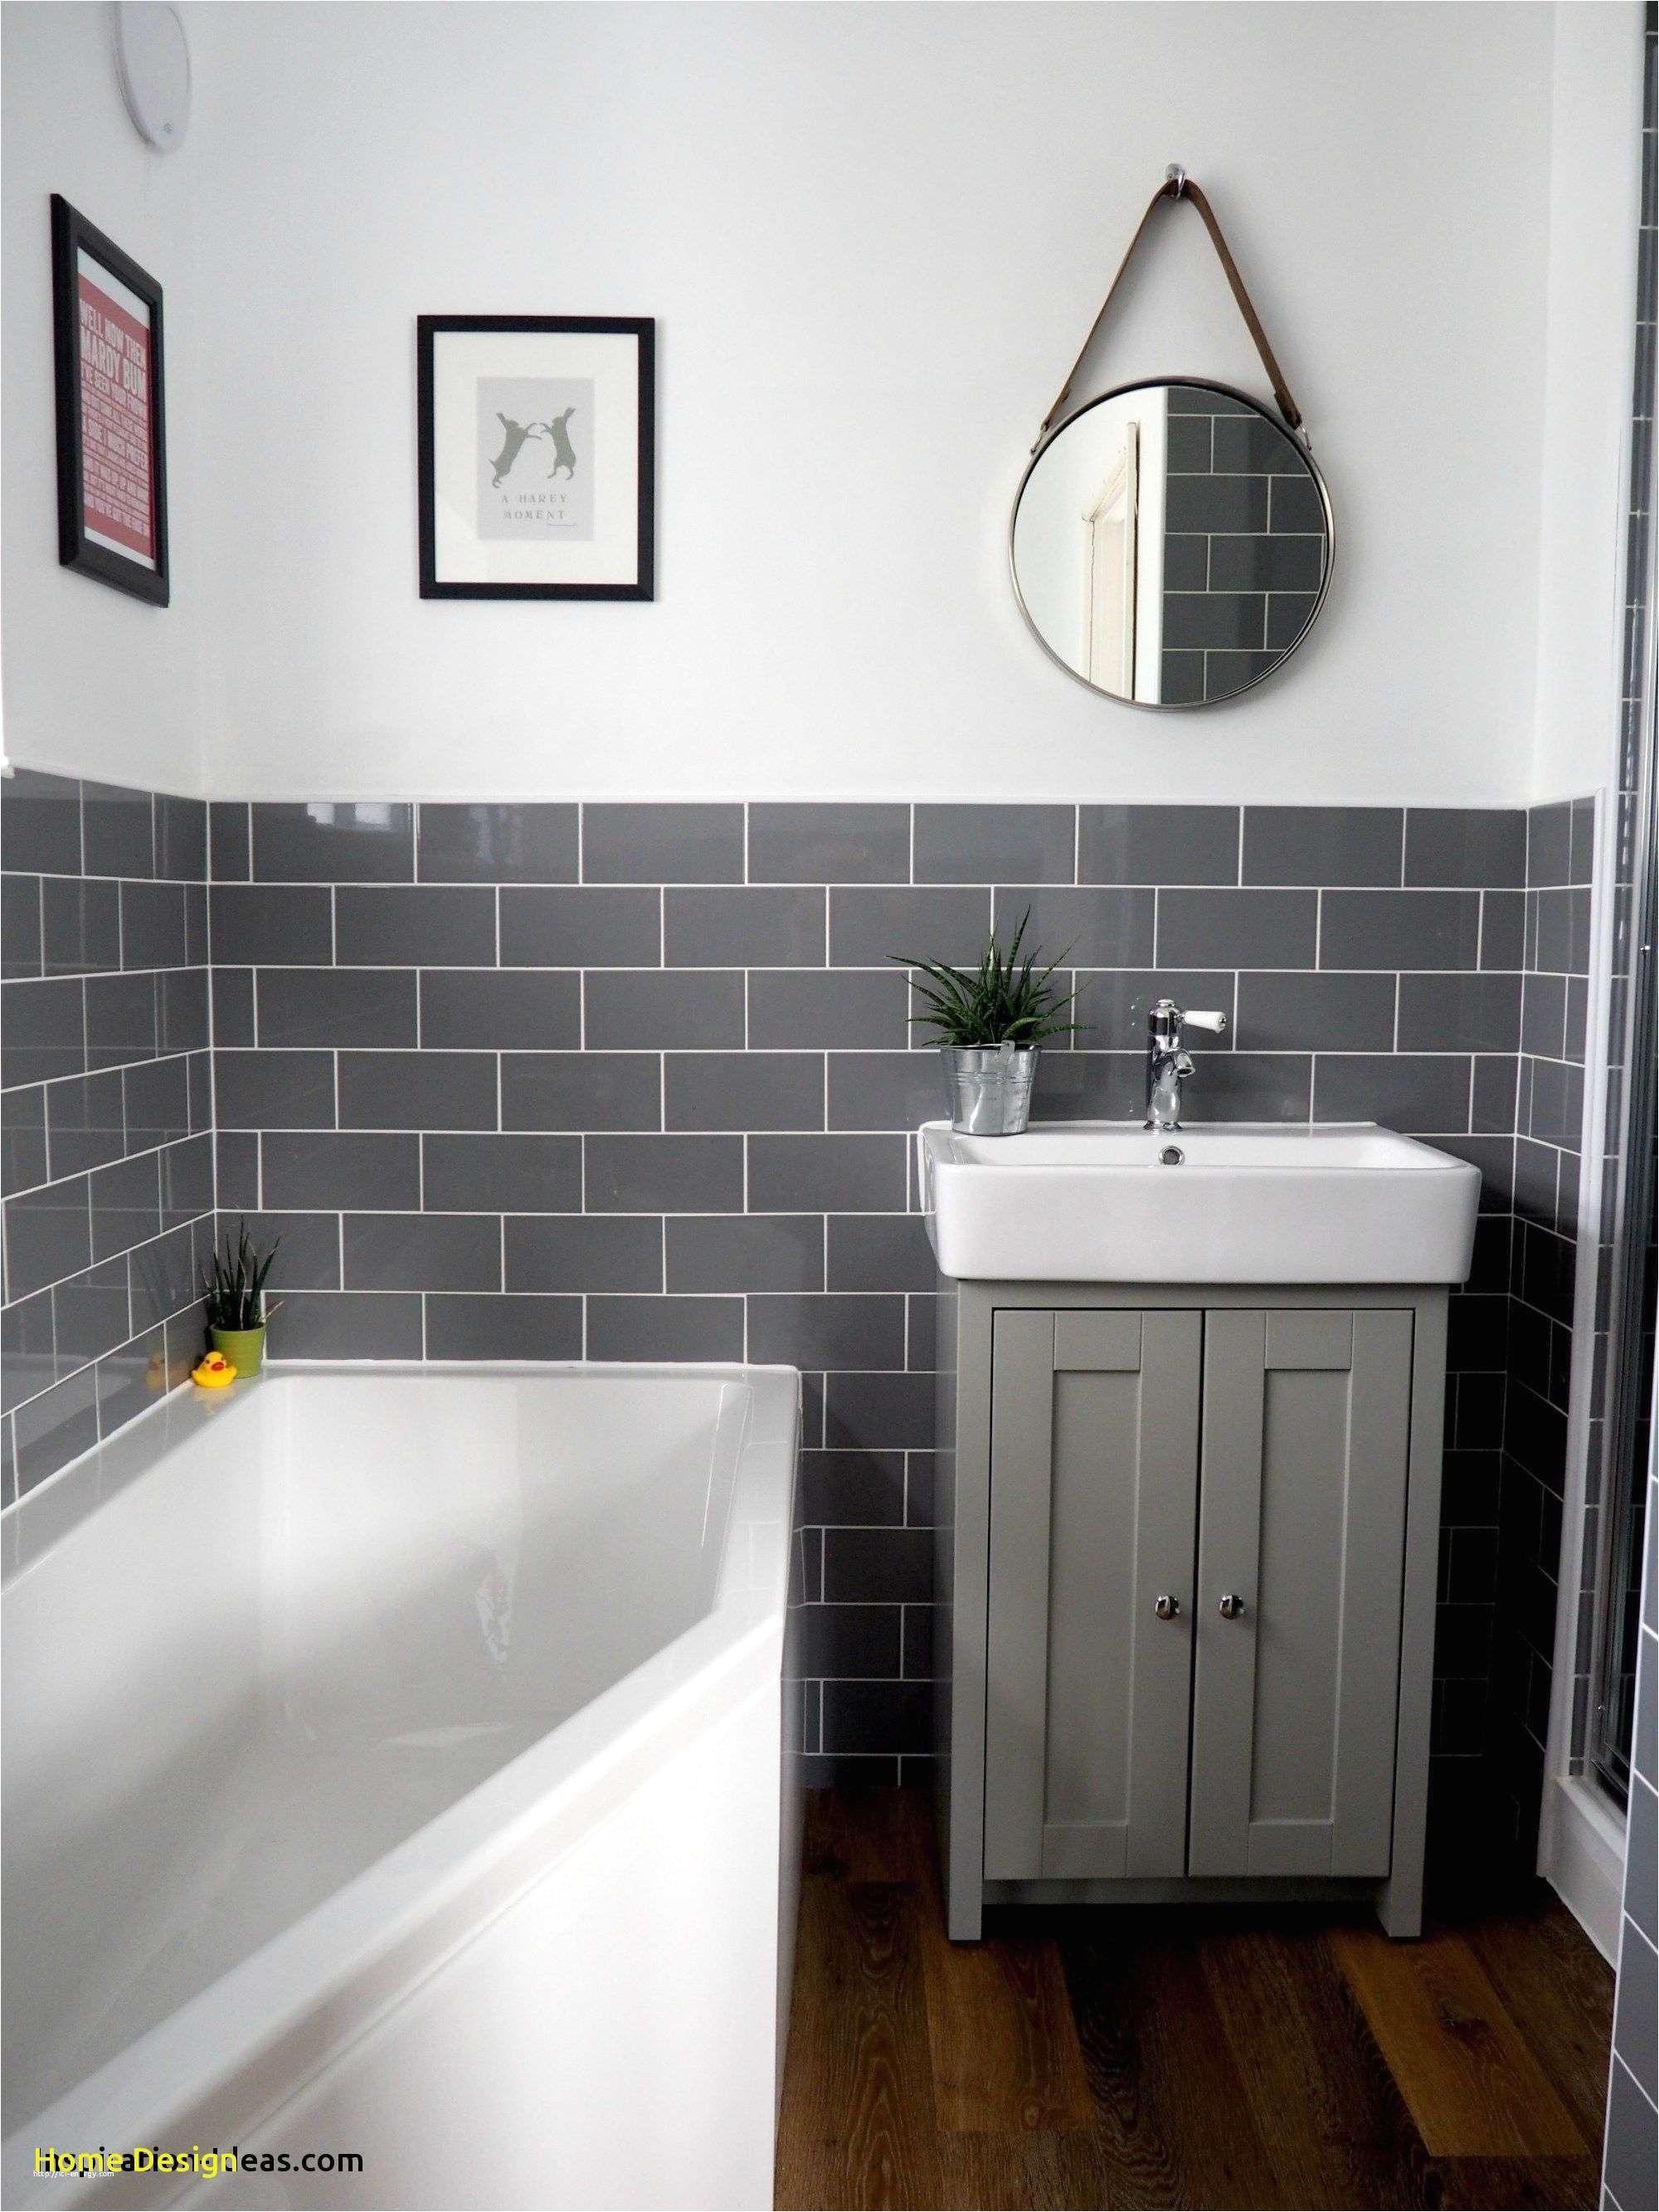 Bathroom 38 Bathroom Design Ideas Beautiful Awesome Bathroom Picture Ideas Lovely Tag Toilet Ideas 0d